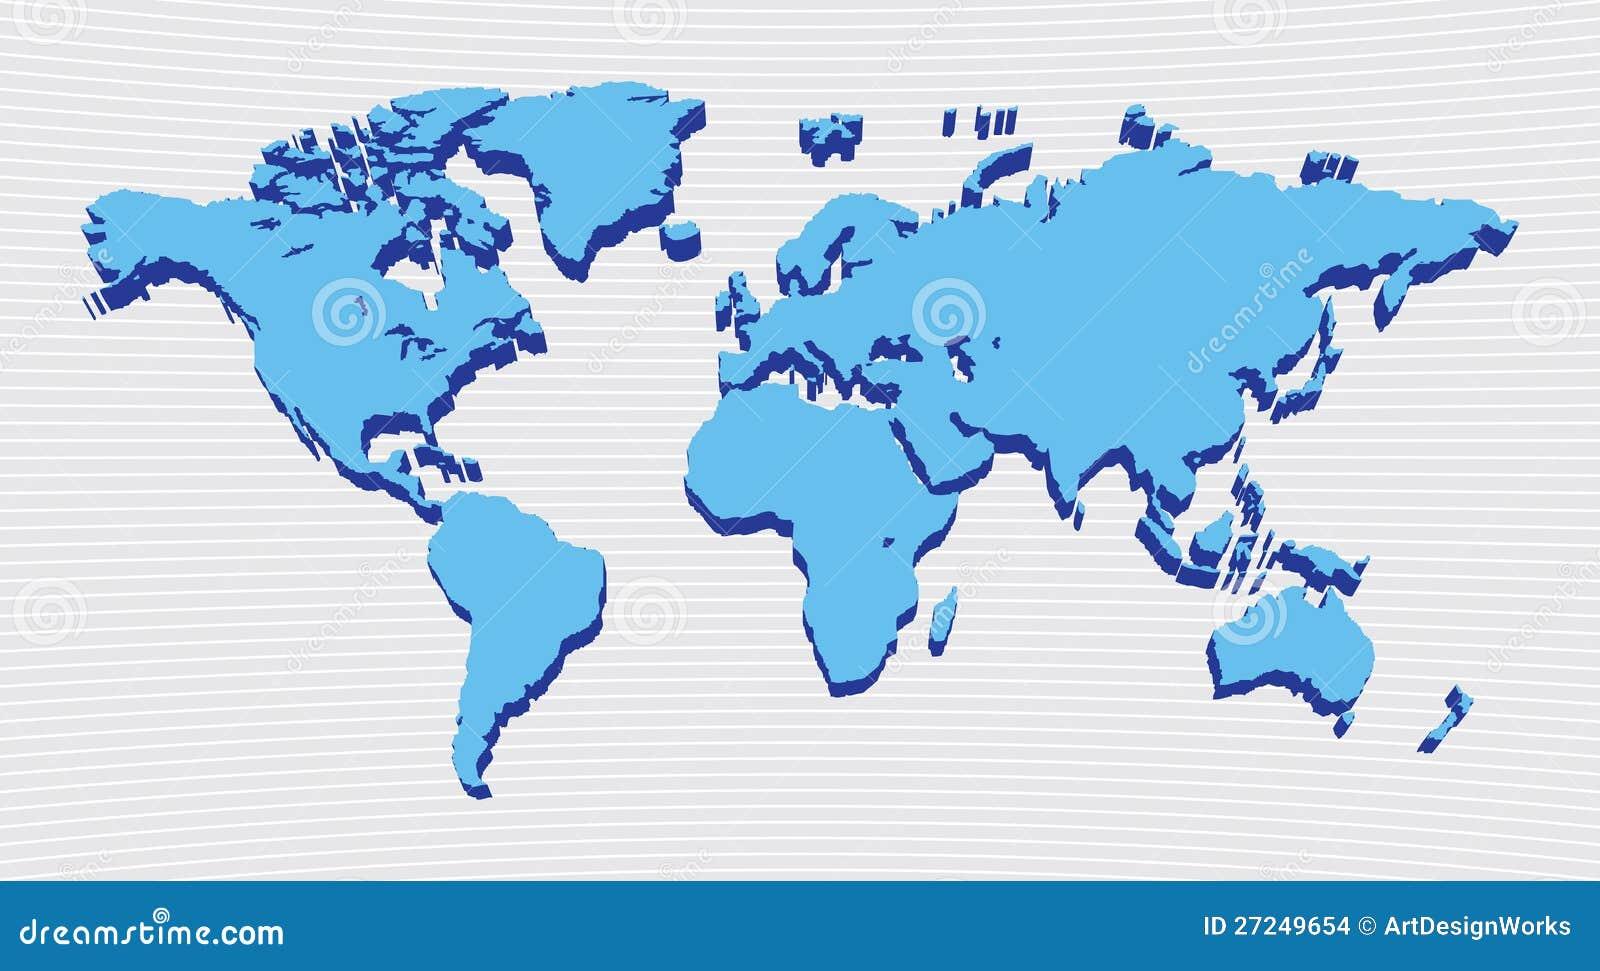 World map design stock vector illustration of general 27249654 download comp gumiabroncs Images